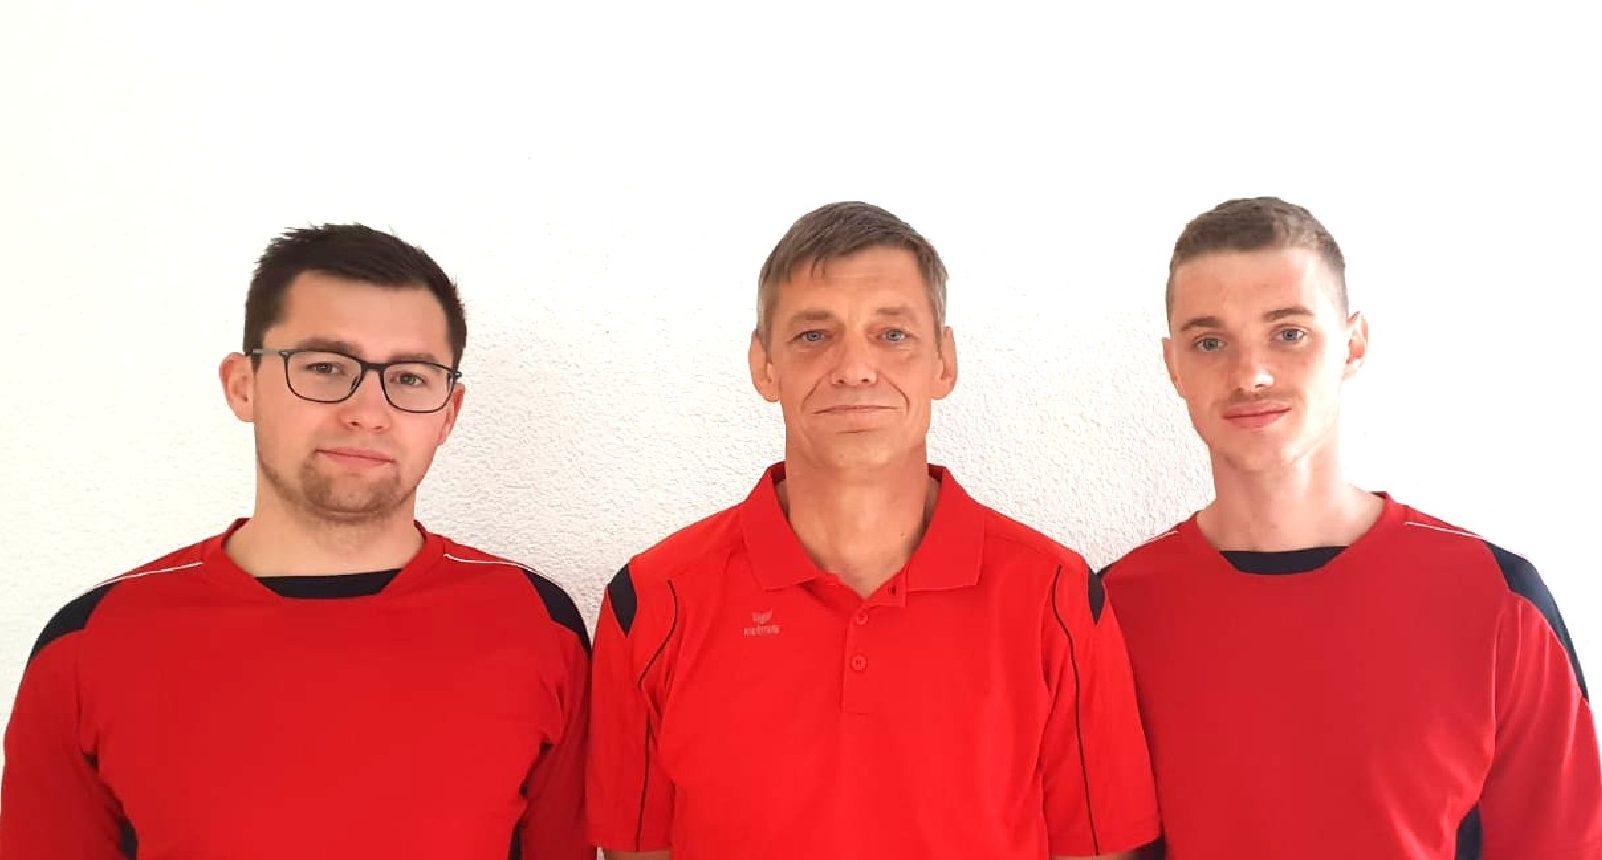 Nico Schlathaus, Lars Nagel, Pascal Nagel (Auszubildender)